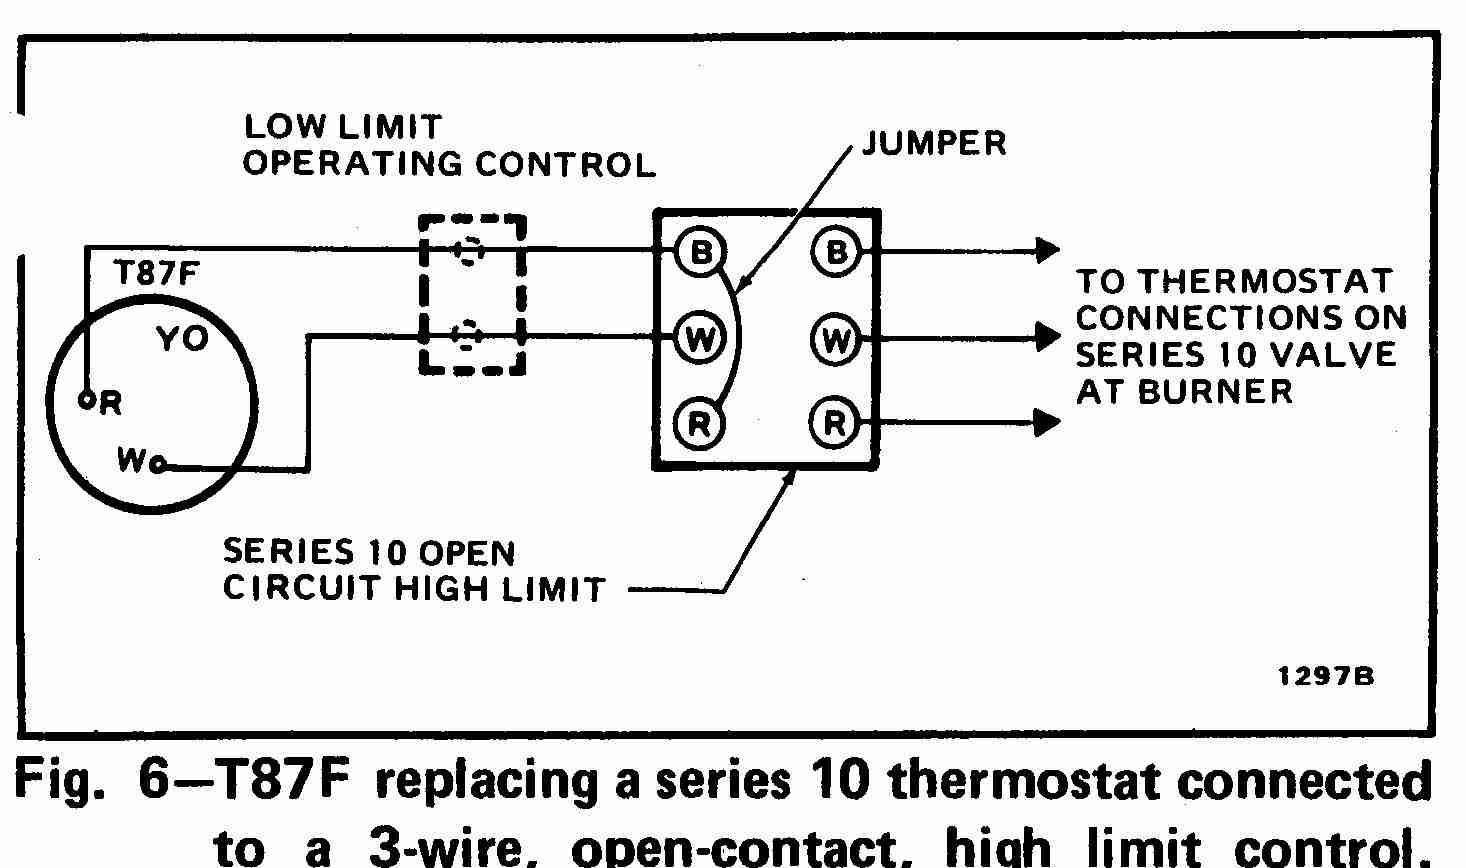 Diagram V8043e1012 To 2 Wire Thermostat Wiring Diagram Full Version Hd Quality Wiring Diagram Mvswiringx26 Locandadossello It